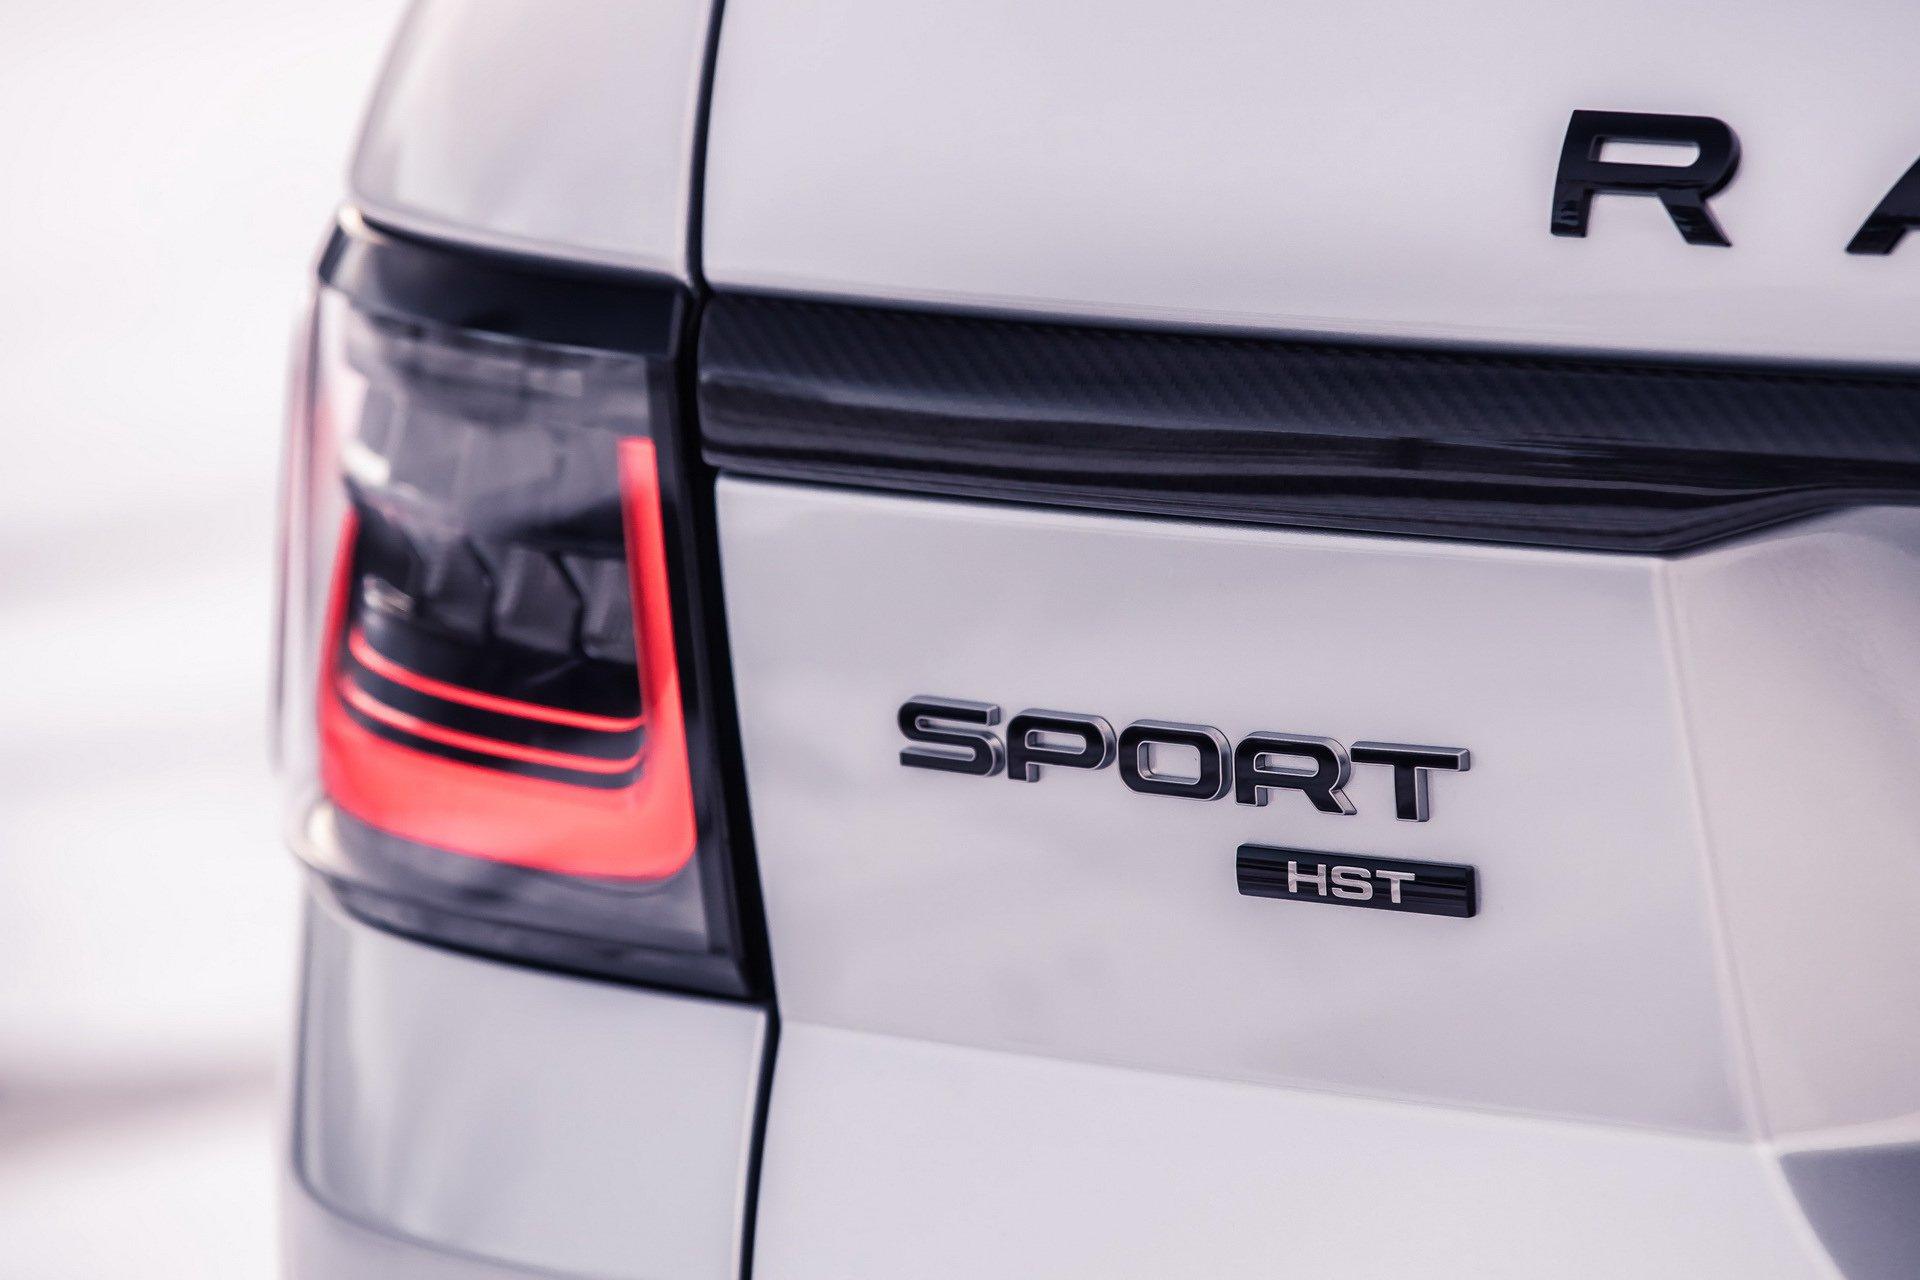 A9ce825f 2019 Range Rover Sport Hst 02